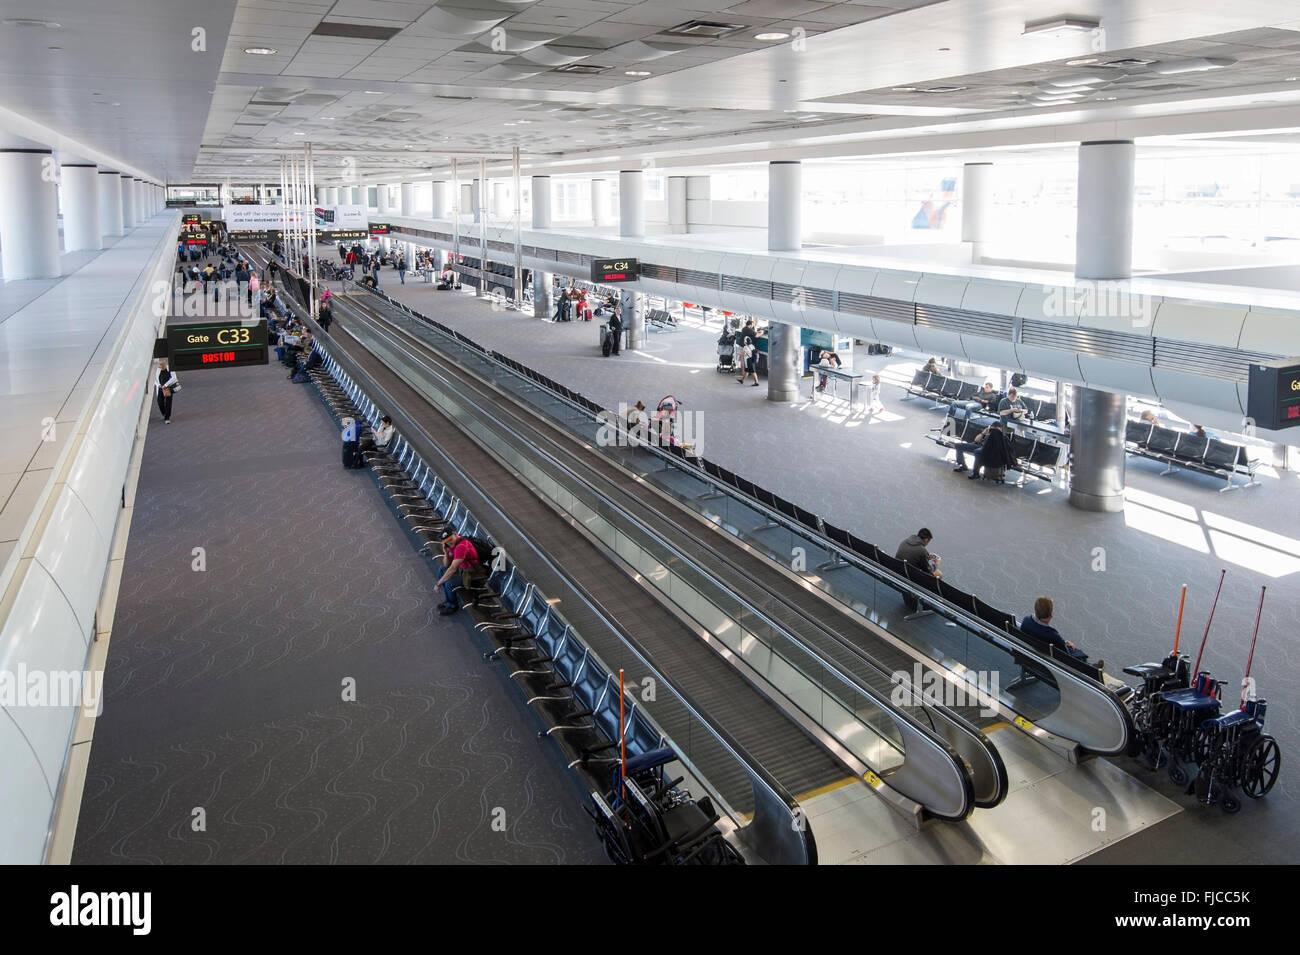 Moving Sidewalk, Denver Airport, USA - Stock Image